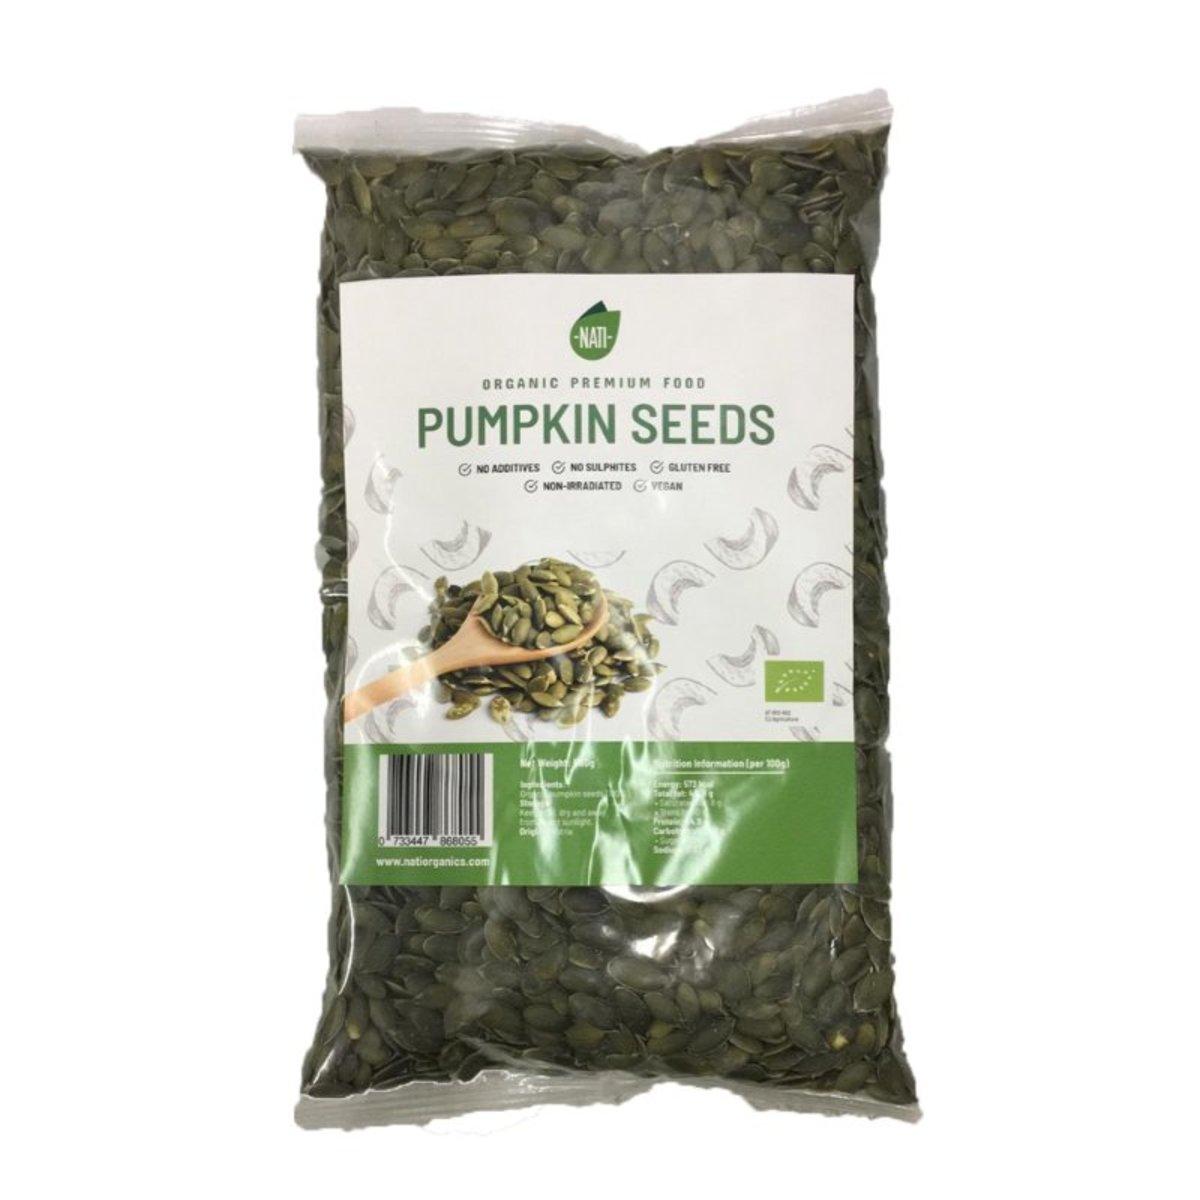 Organic Whole Raw Pumpkin Seeds   (non-bake, keto, healthy snack)